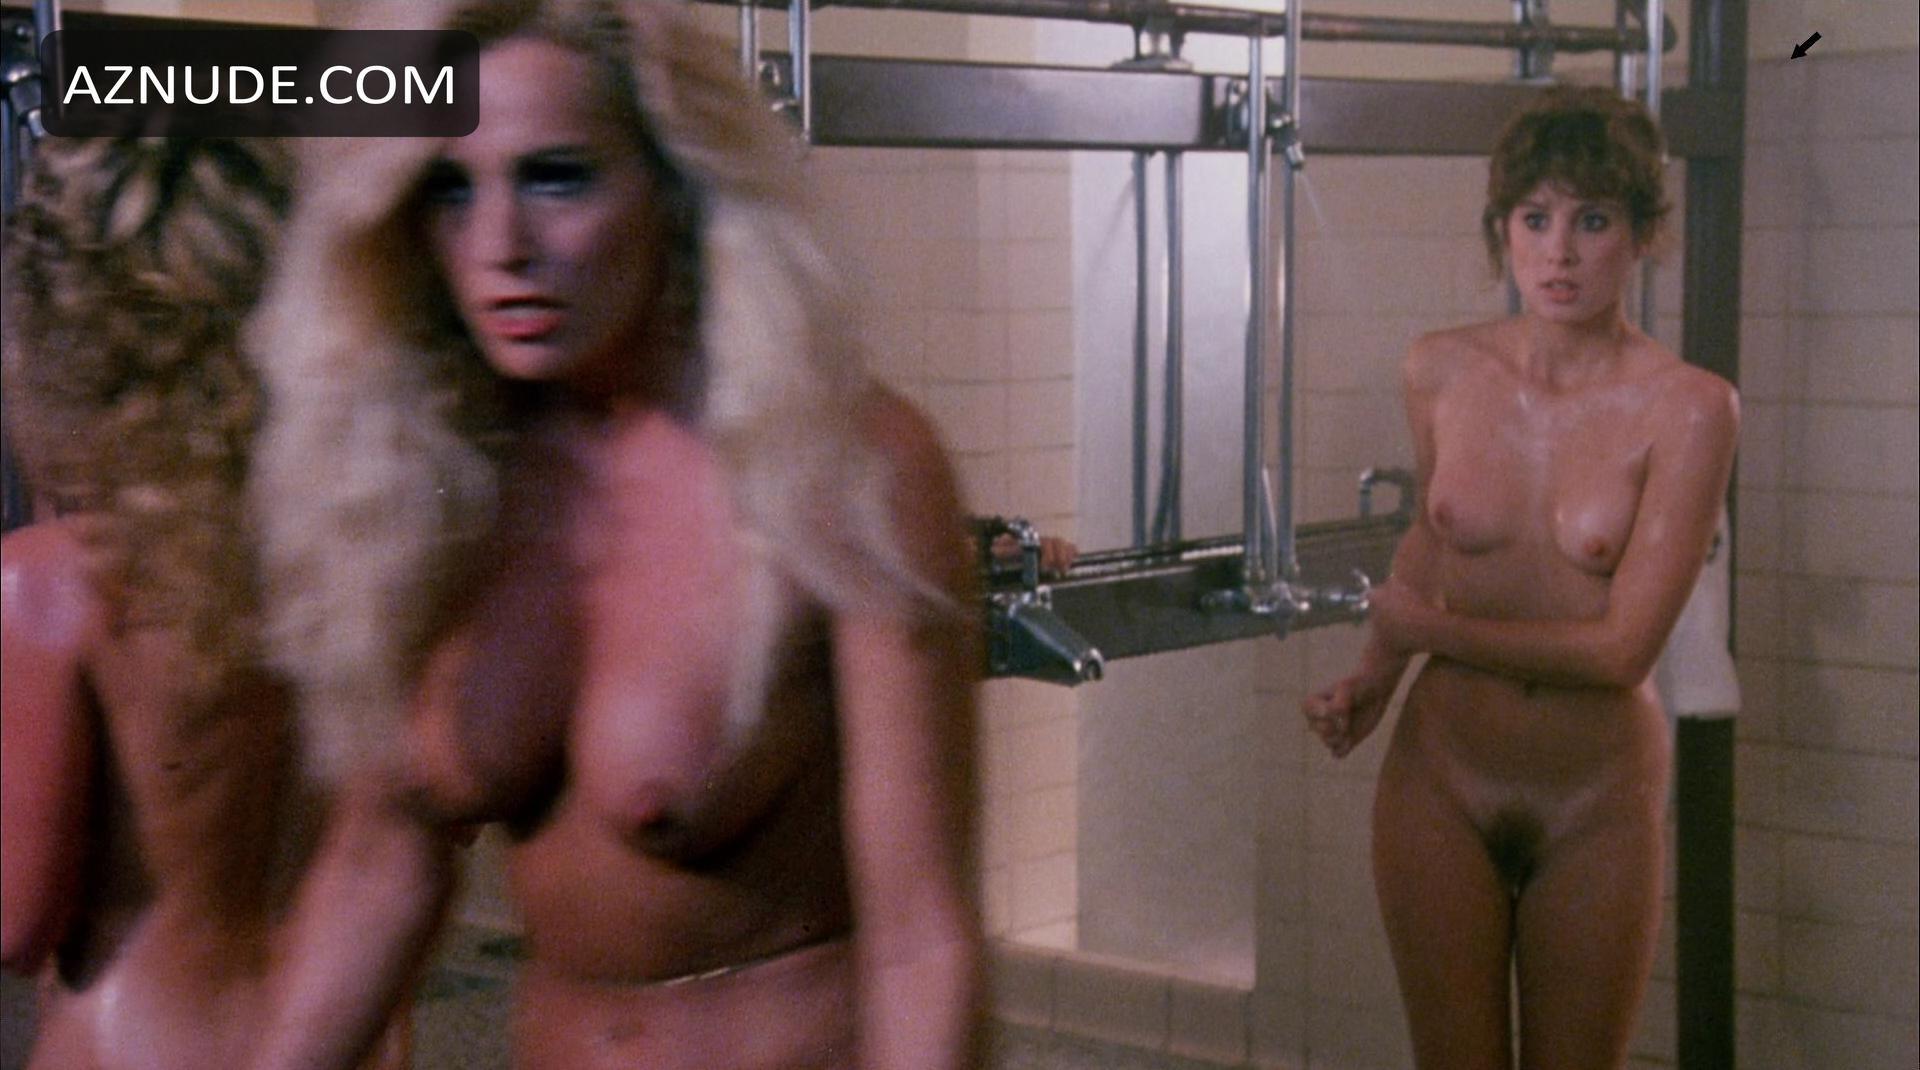 Bad girls from mars nude scenes brinke stevens edy william - 2 part 2